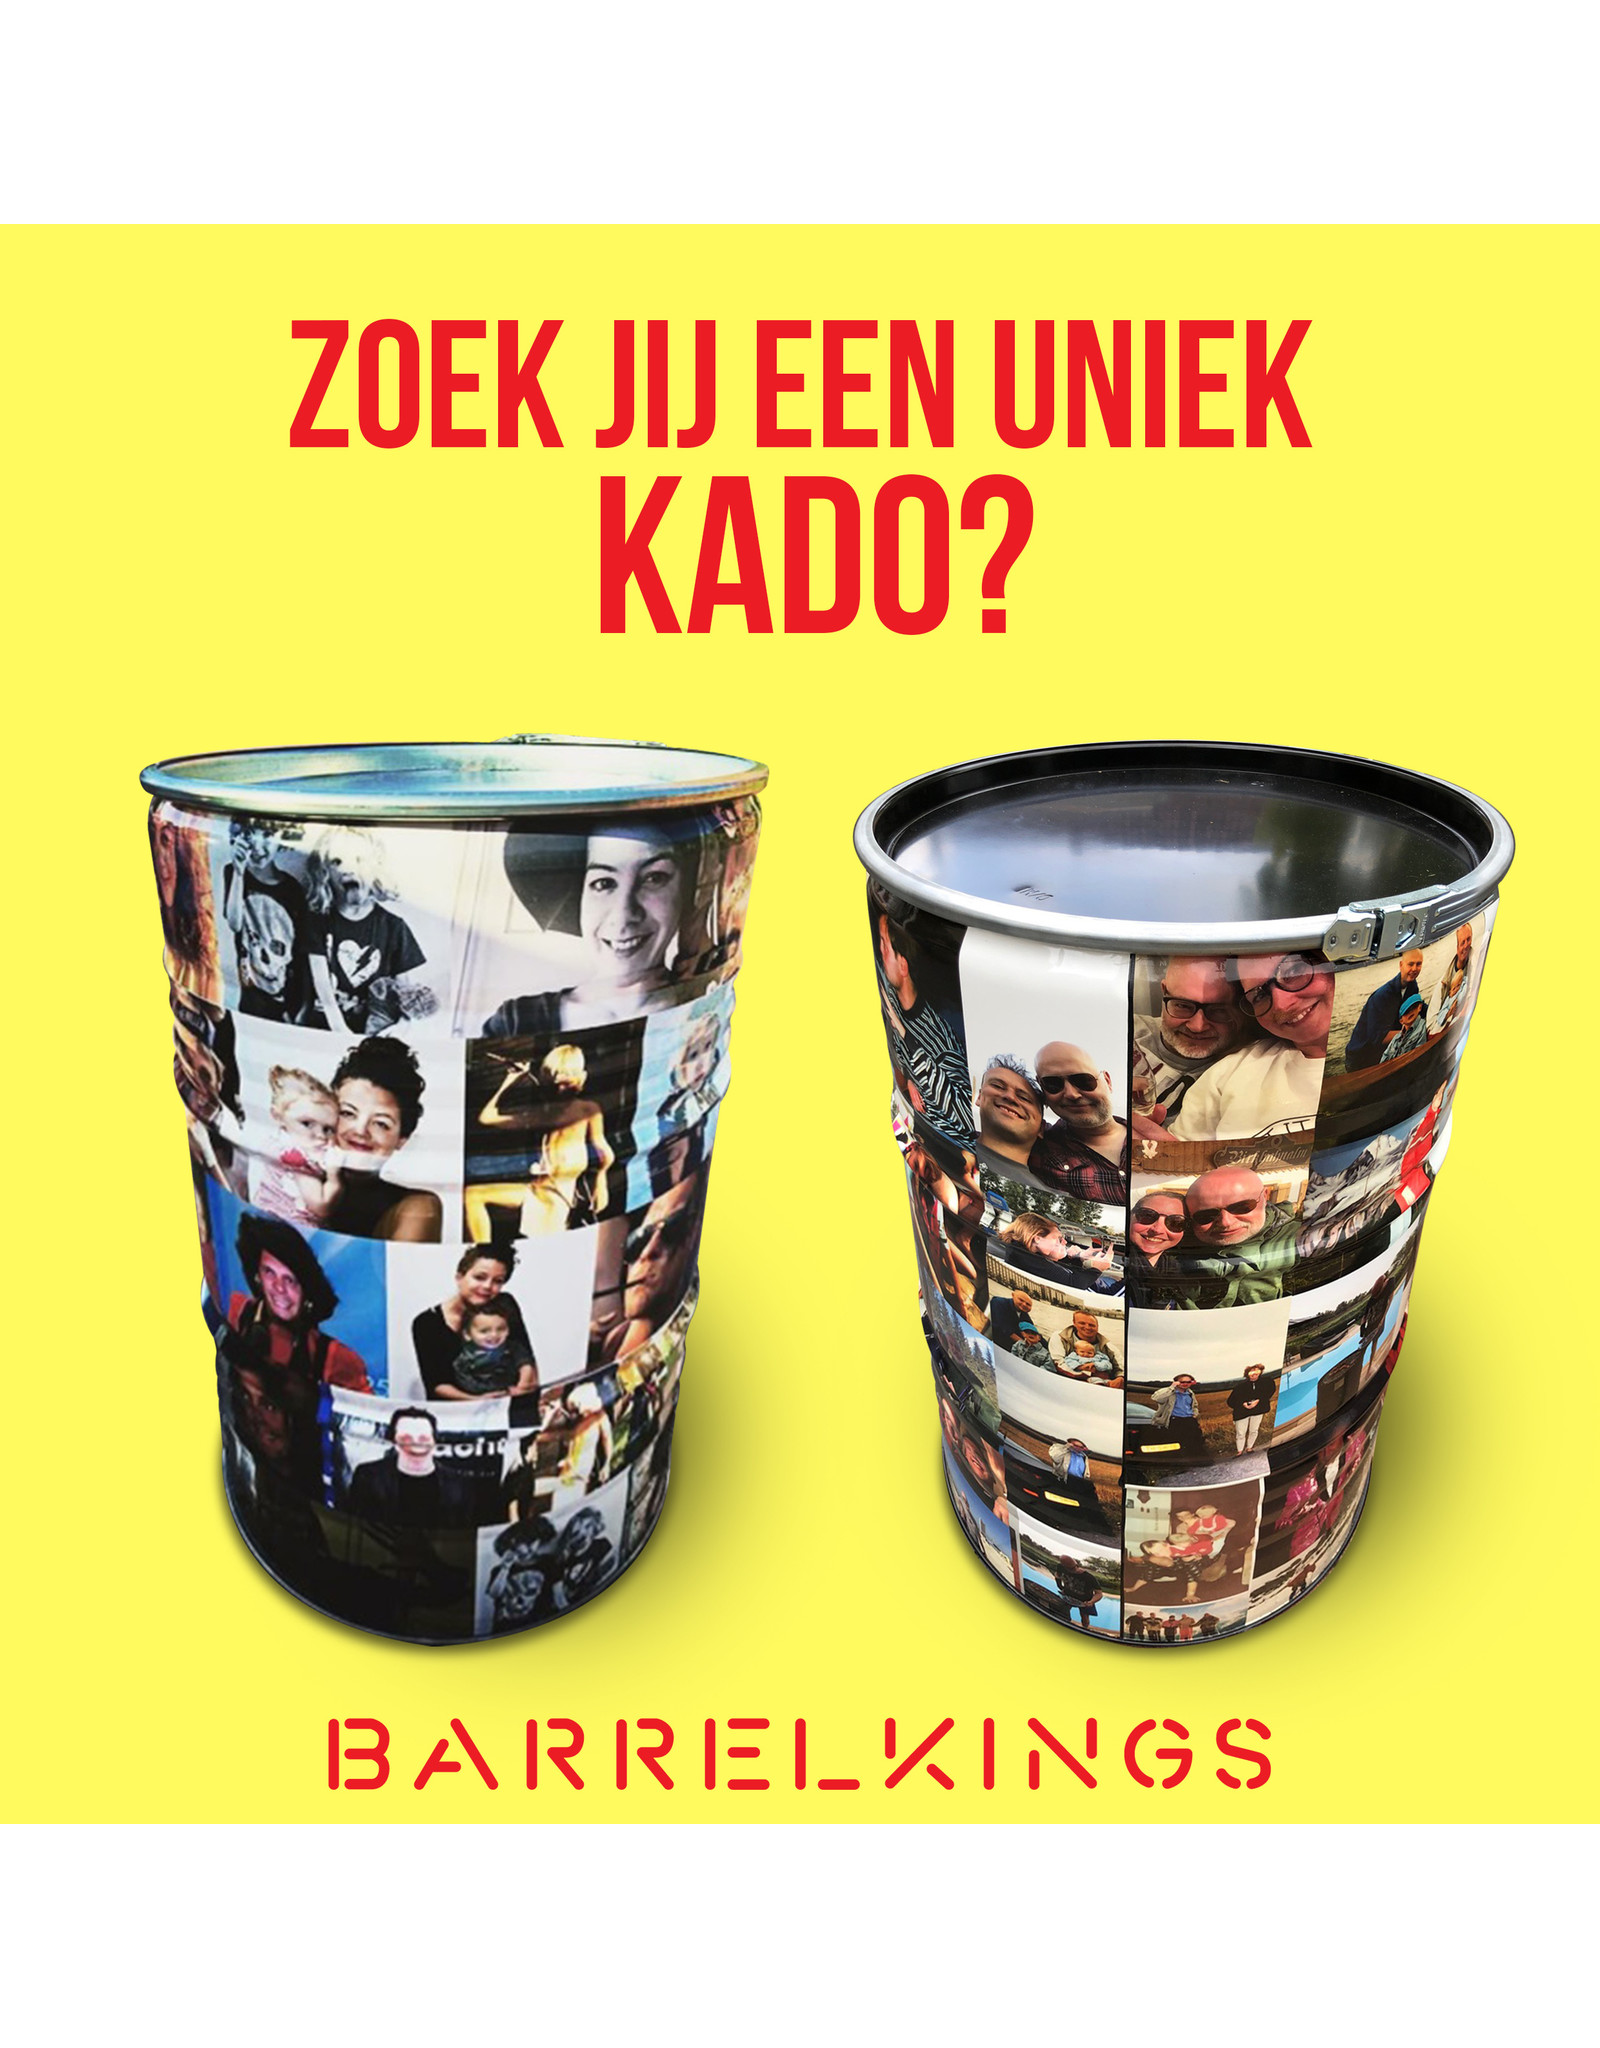 Barrelkings Photo Barrel 200 liter oildrum